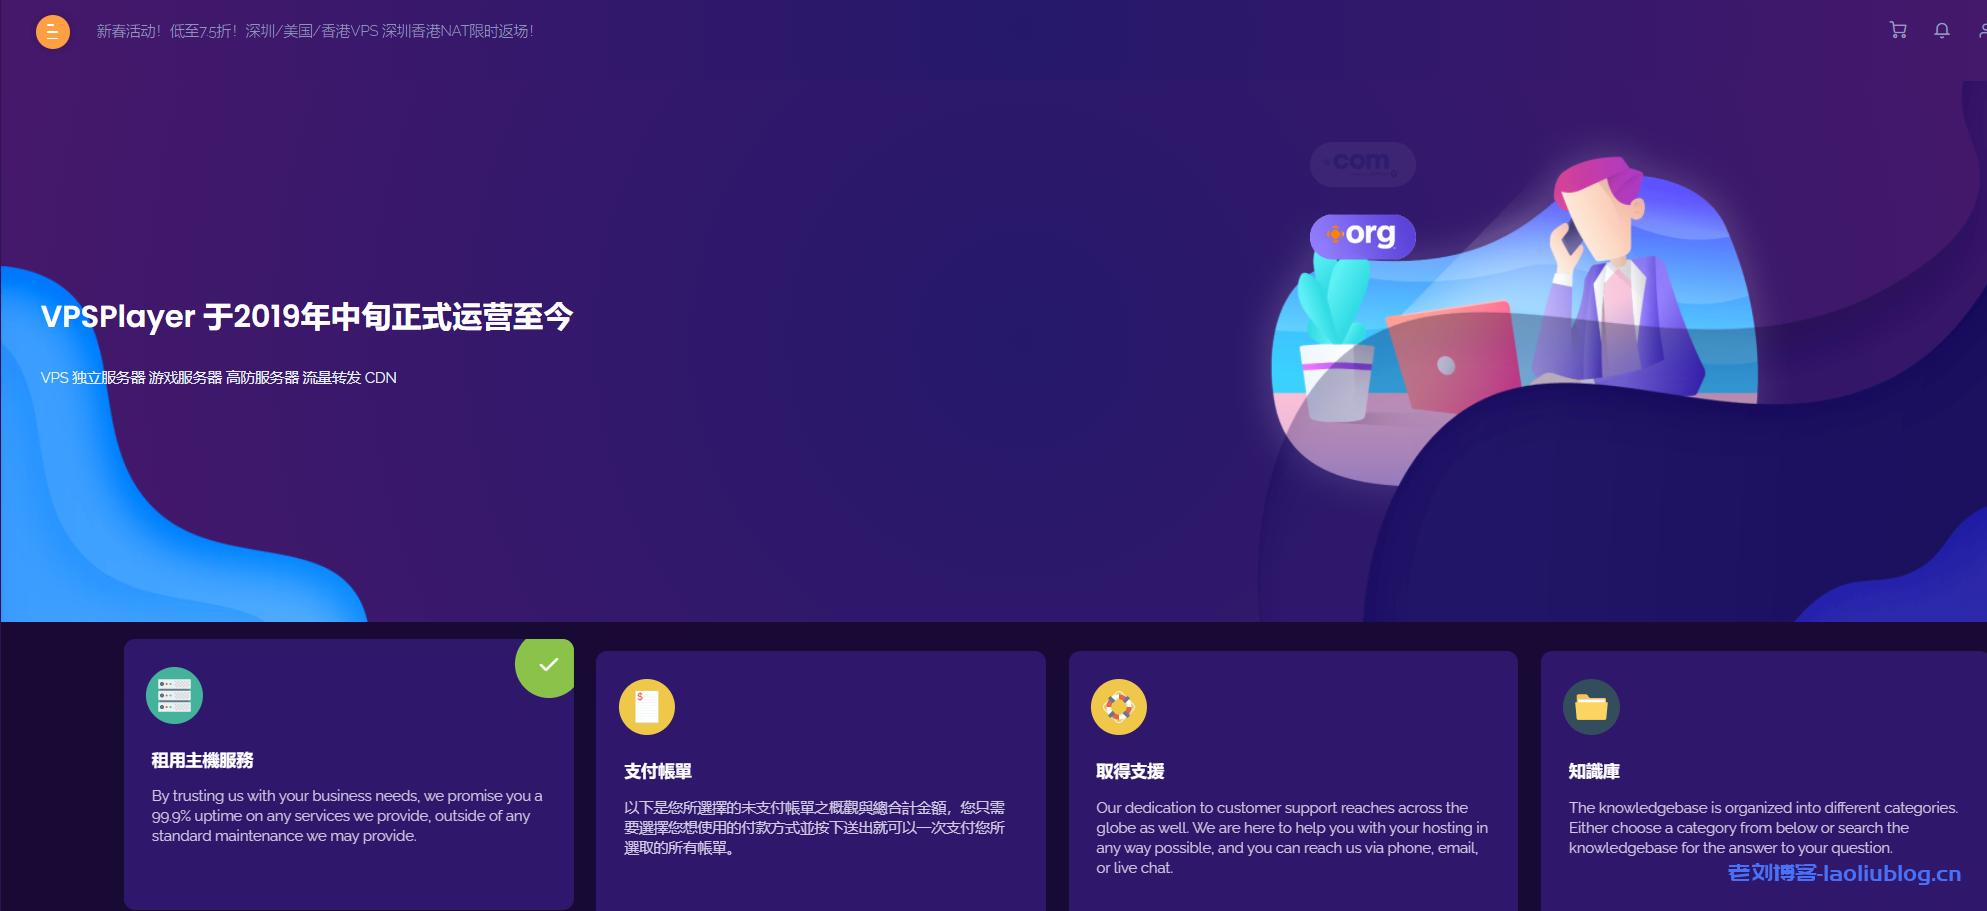 VPS玩家VPSPlayer洛杉矶Cera联通回程KVM VPS:1GB内存100GB NVMe空间1TB月流量2Gbps端口36元/月